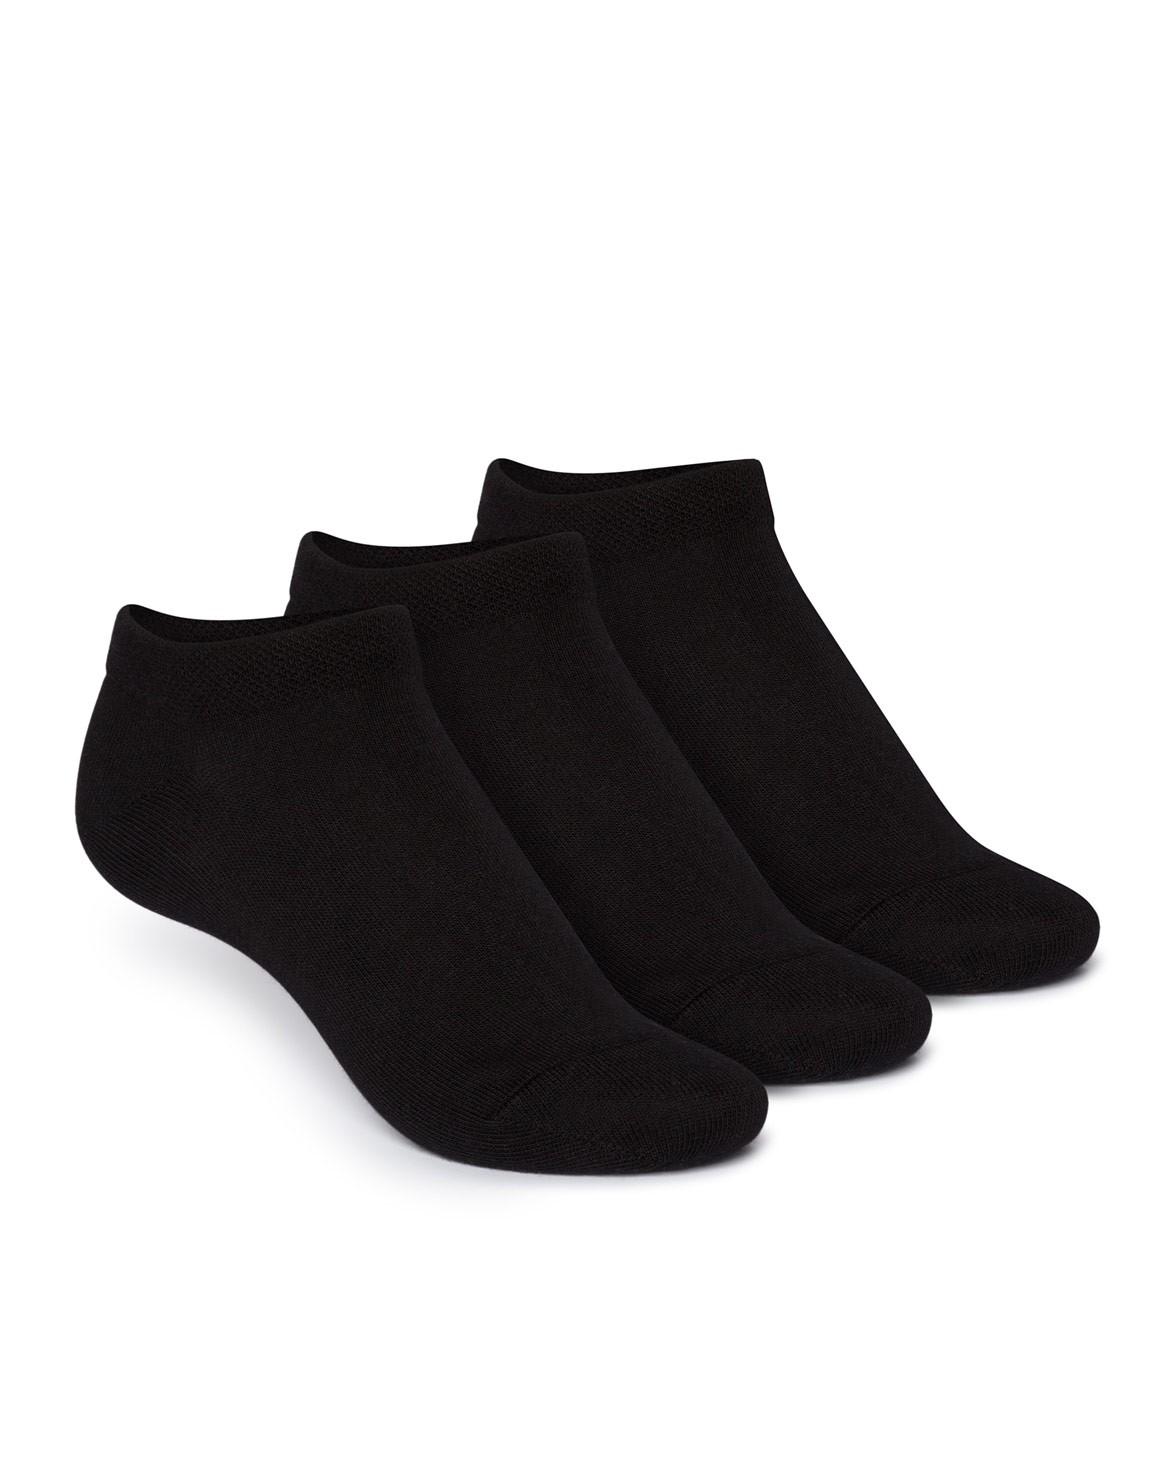 3pack Low Socks